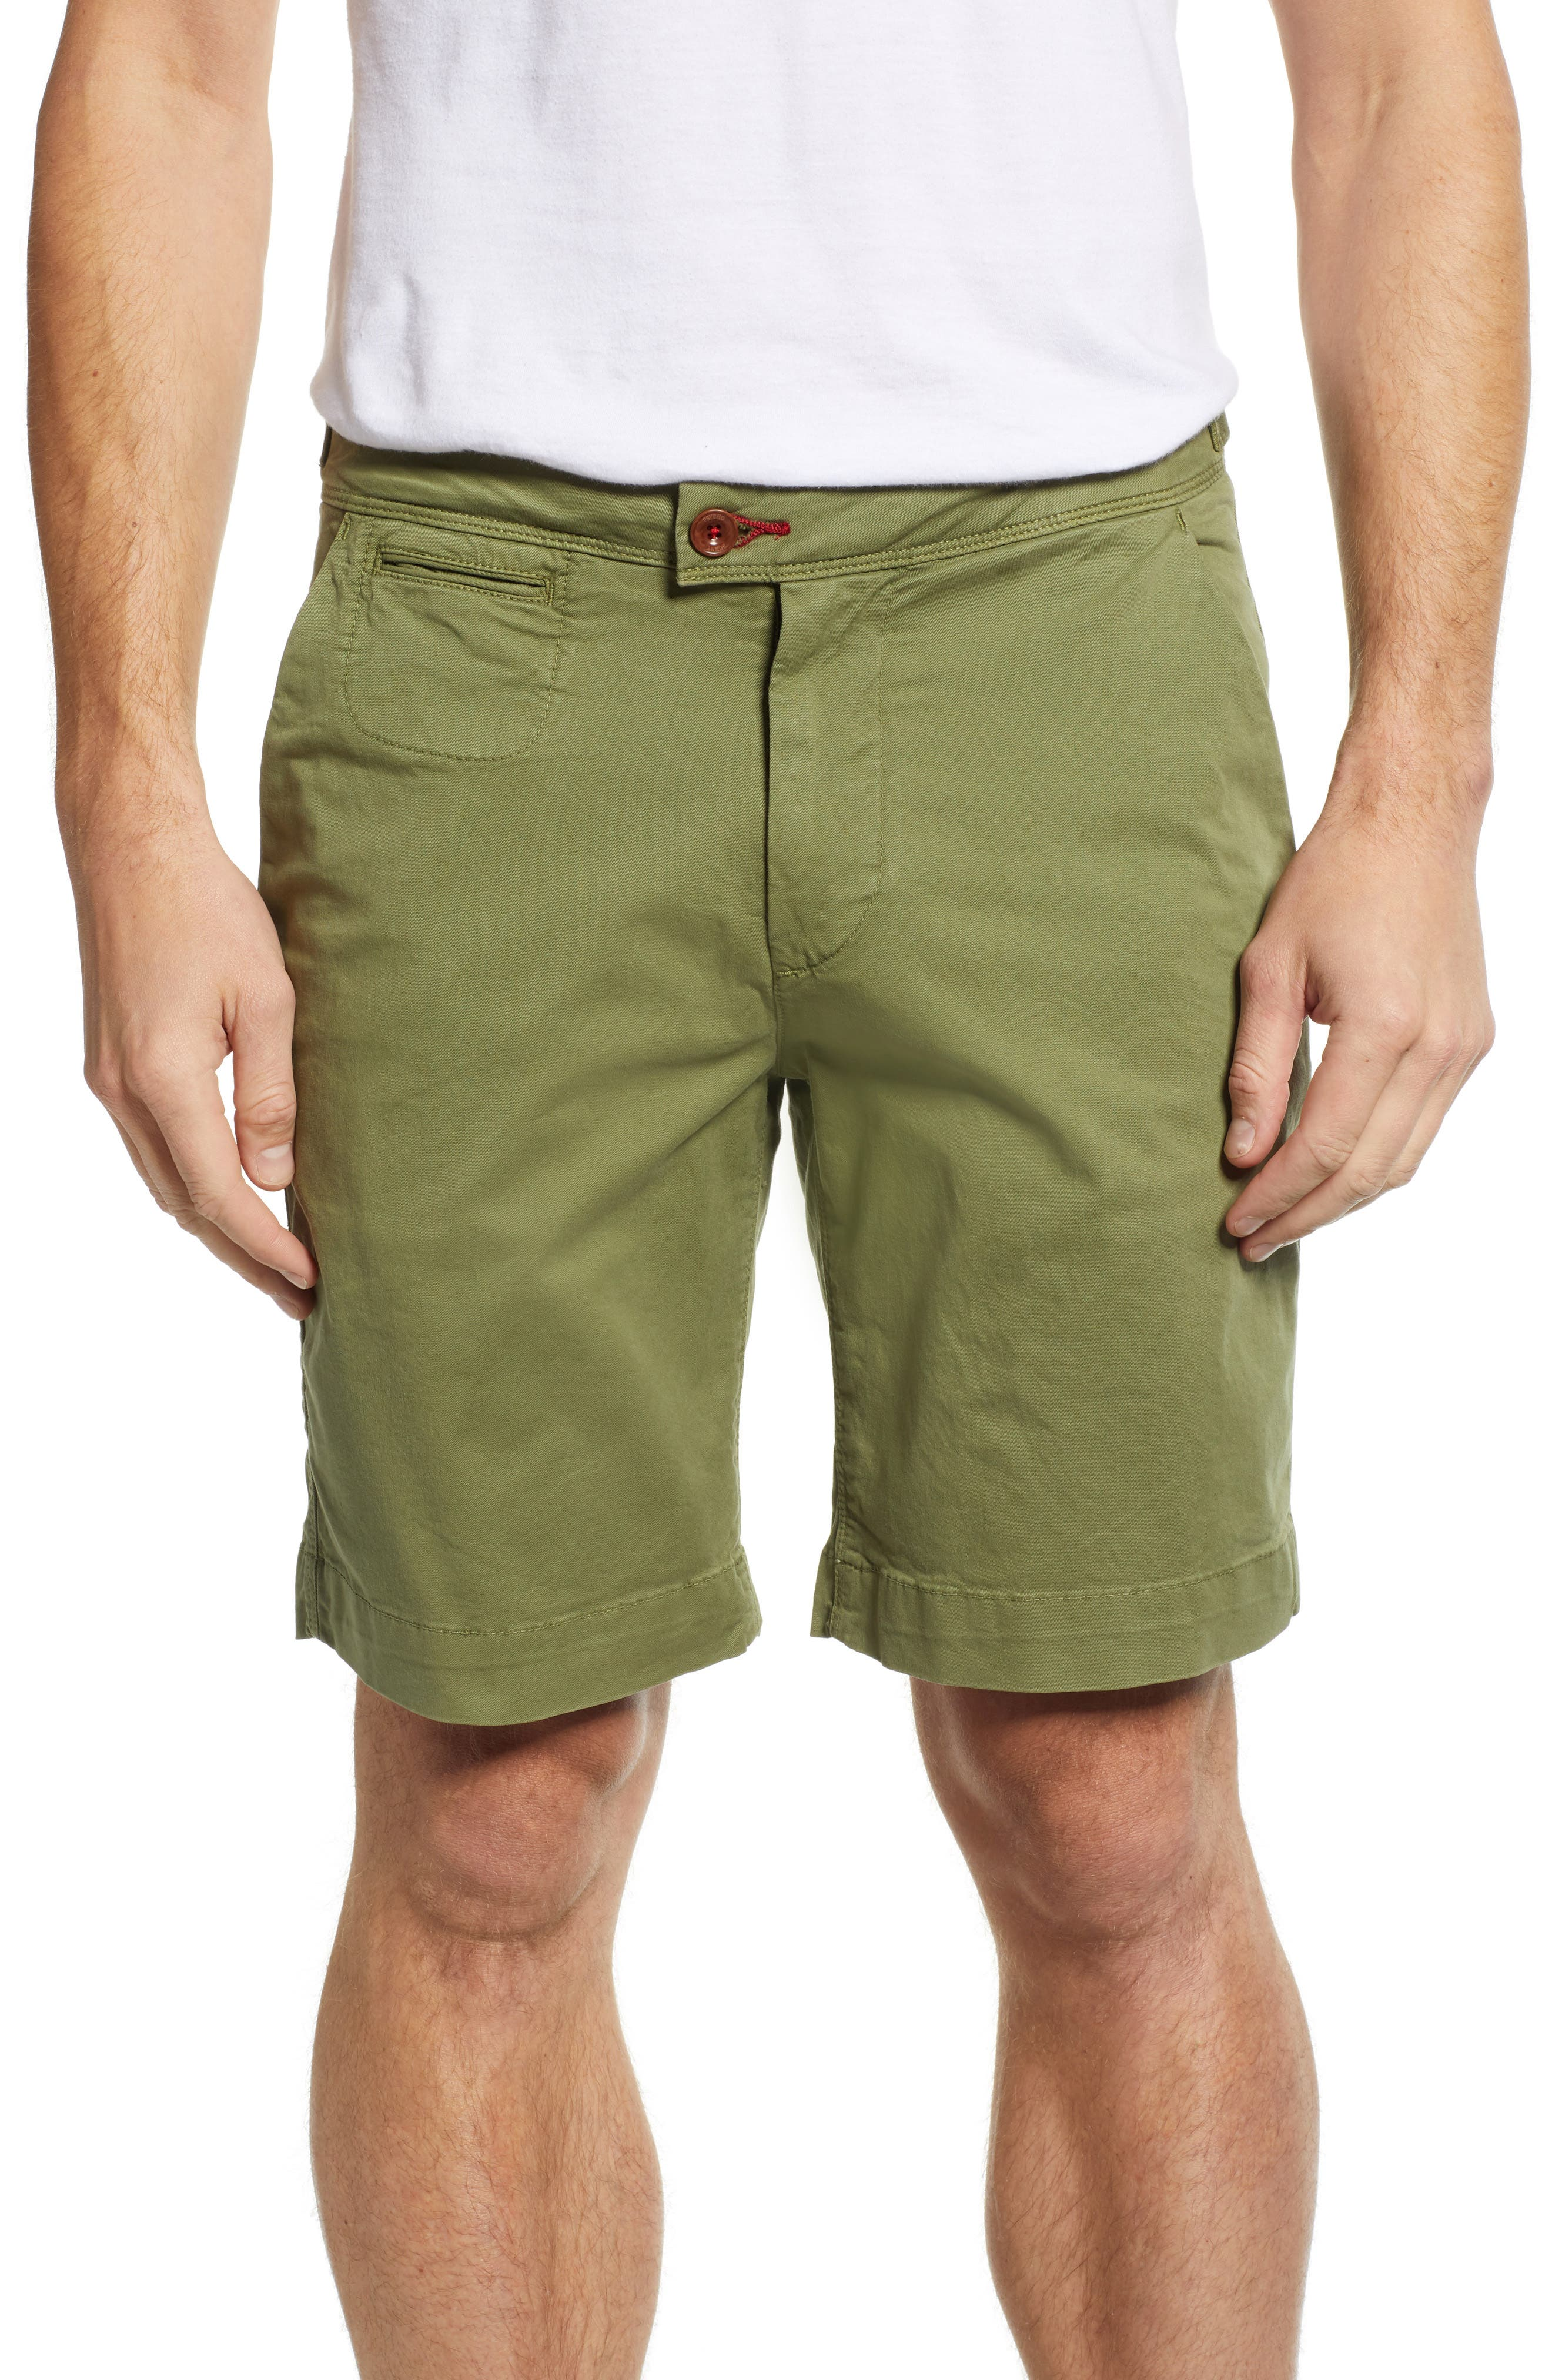 Triumph Shorts,                             Main thumbnail 1, color,                             OLIVINE